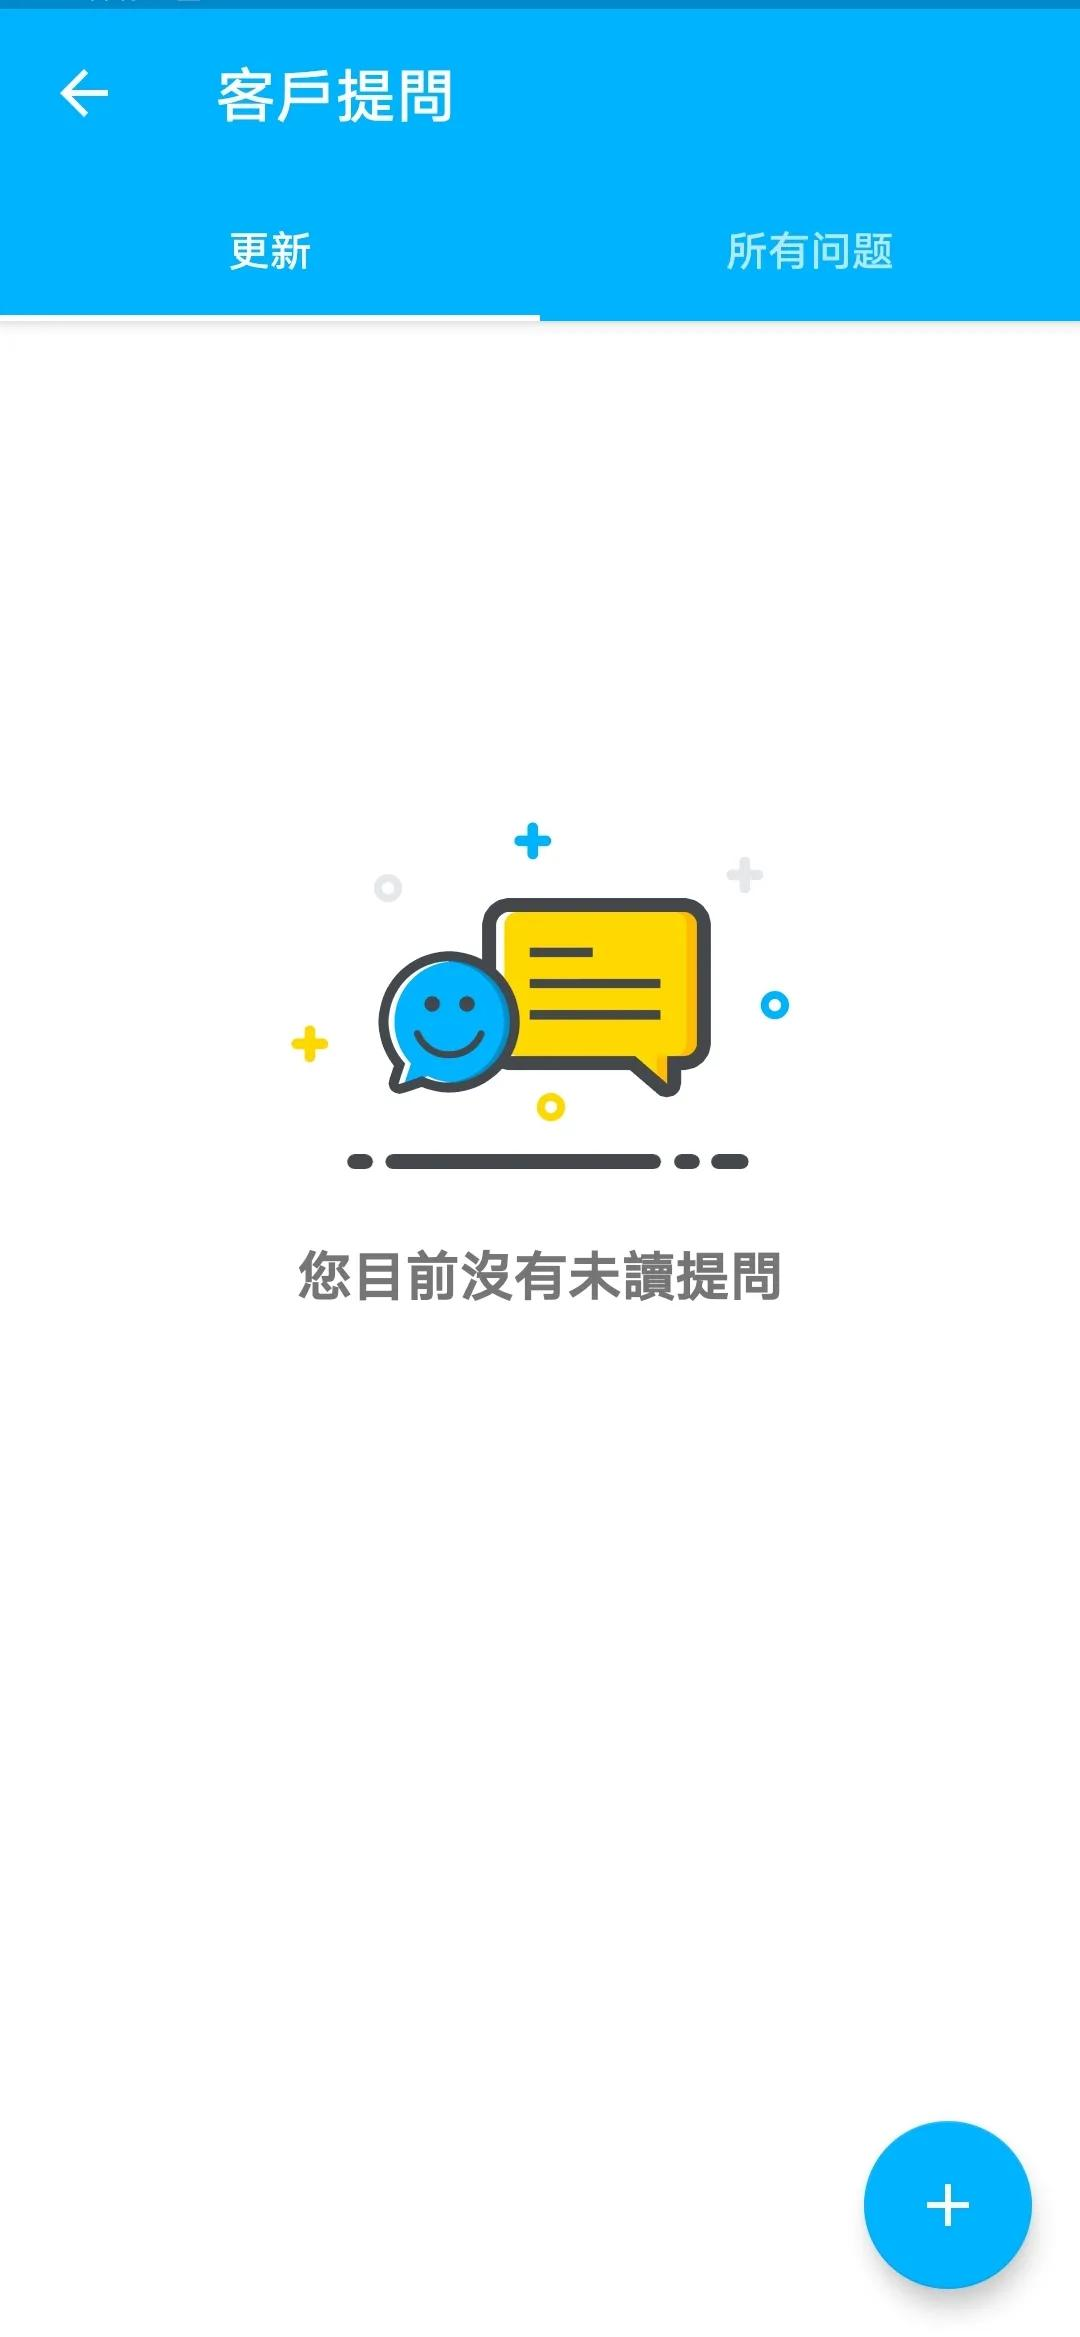 全球最具安全、新颖操作的社交系统工具【YouChat】